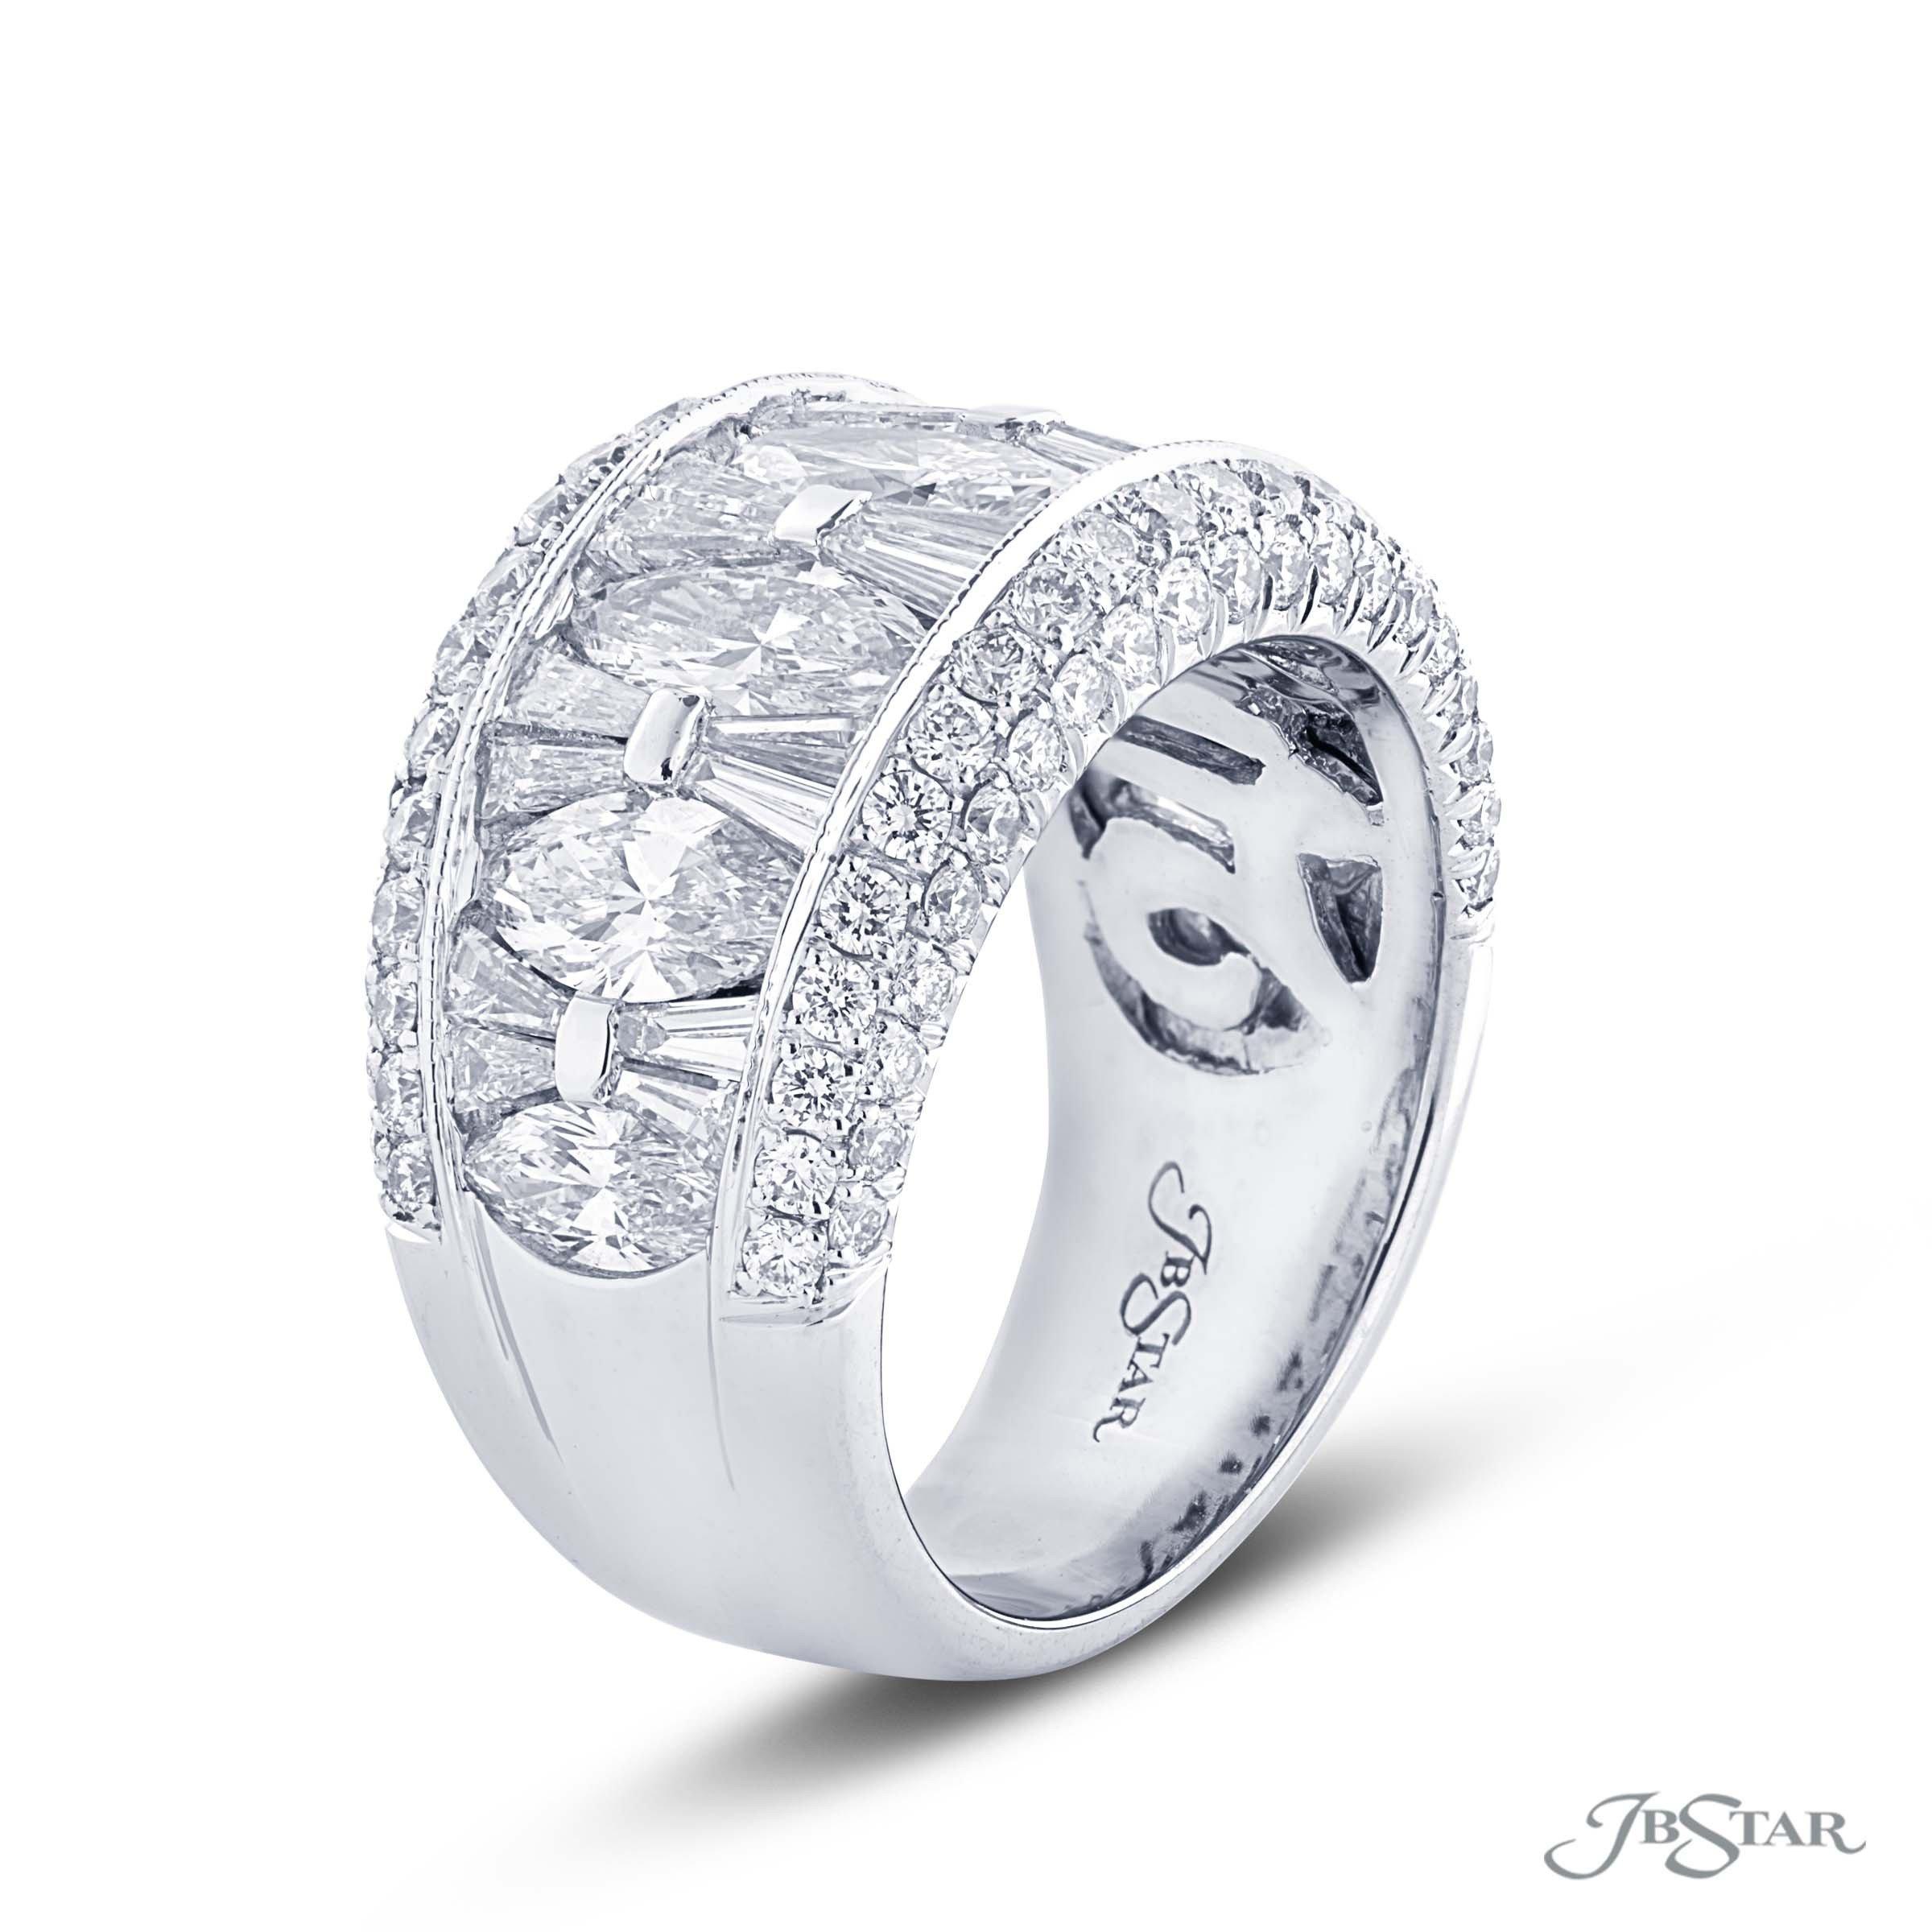 Rings JB Star LaNae Fine Jewelry